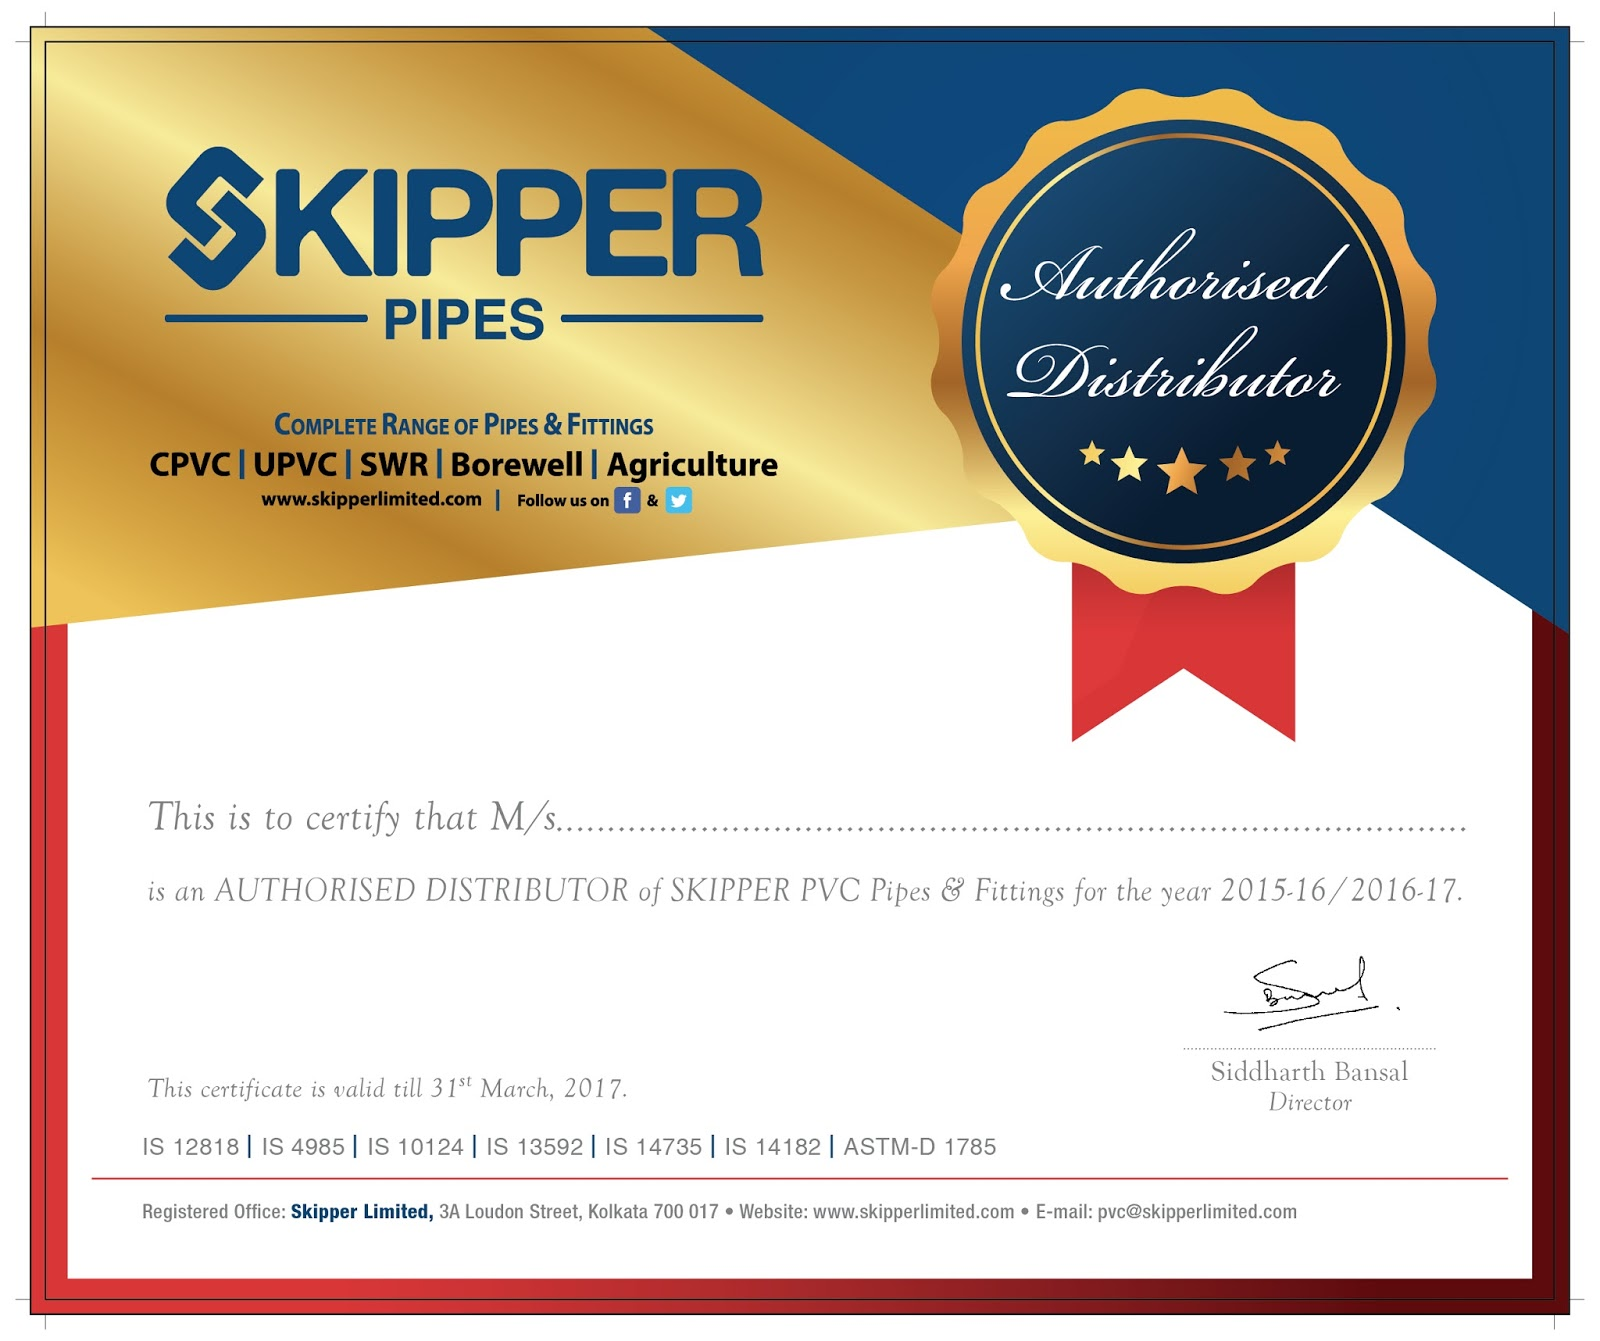 Distributor certificate distributor certificate share altavistaventures Choice Image